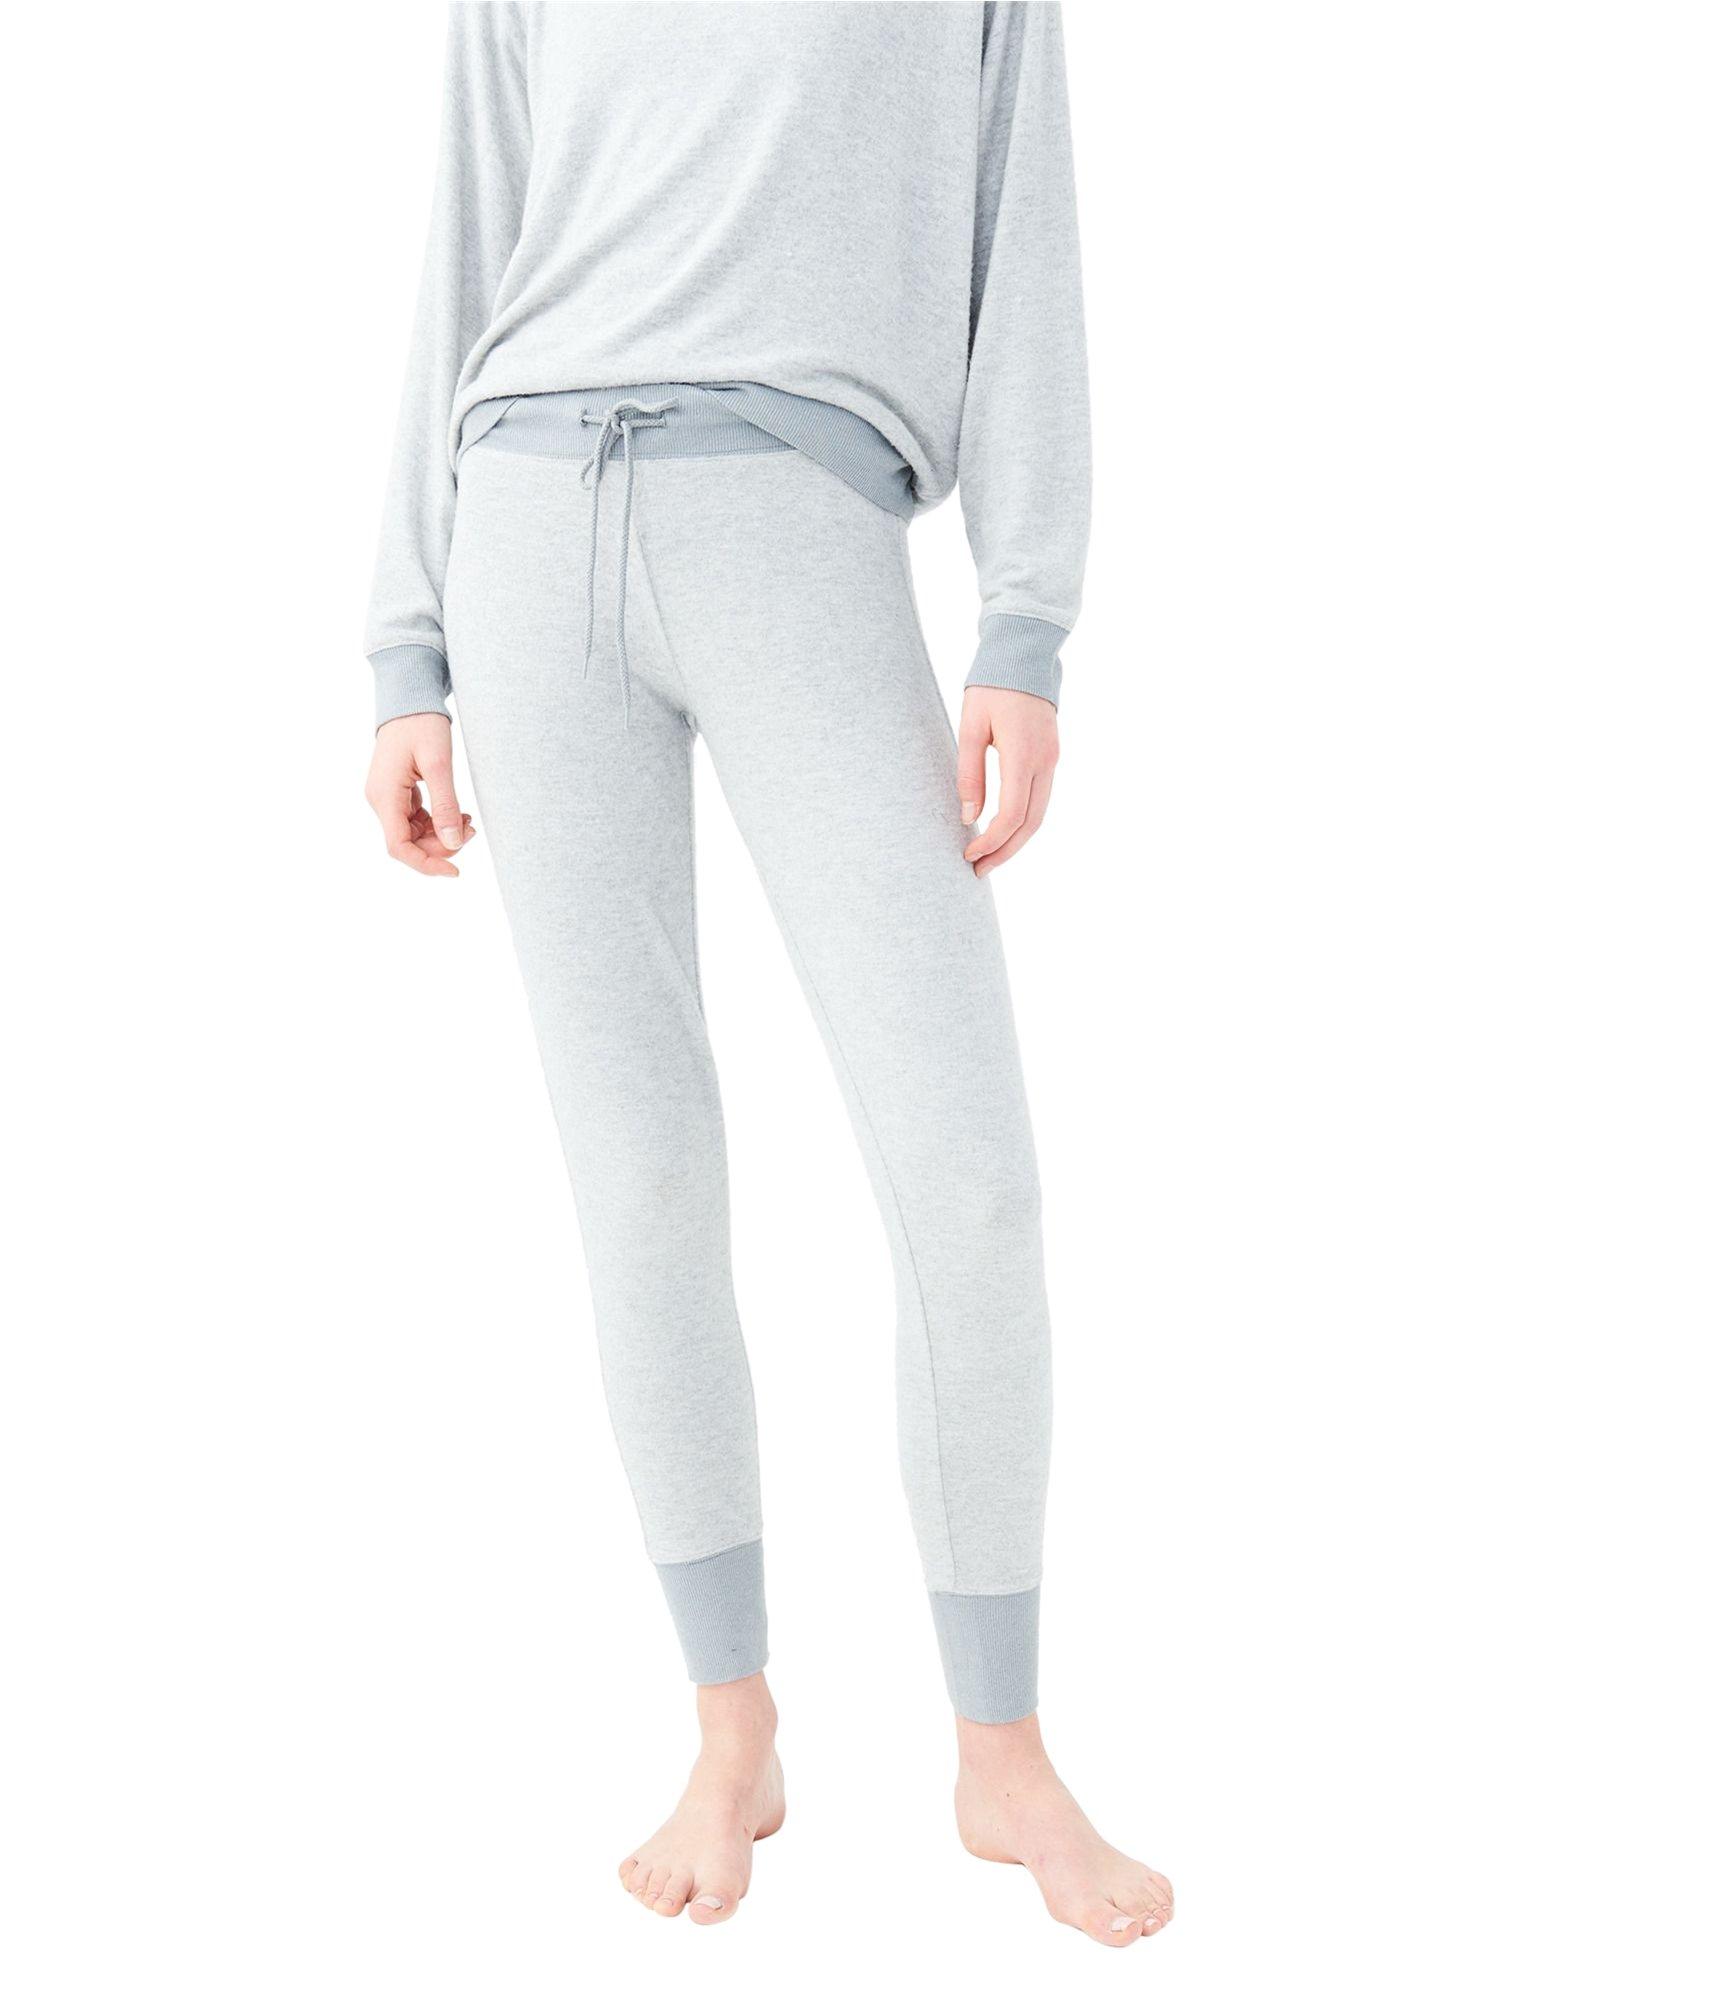 Aeropostale Womens Fuzzy Pajama Jogger Pants Grey XS/28 - Juniors